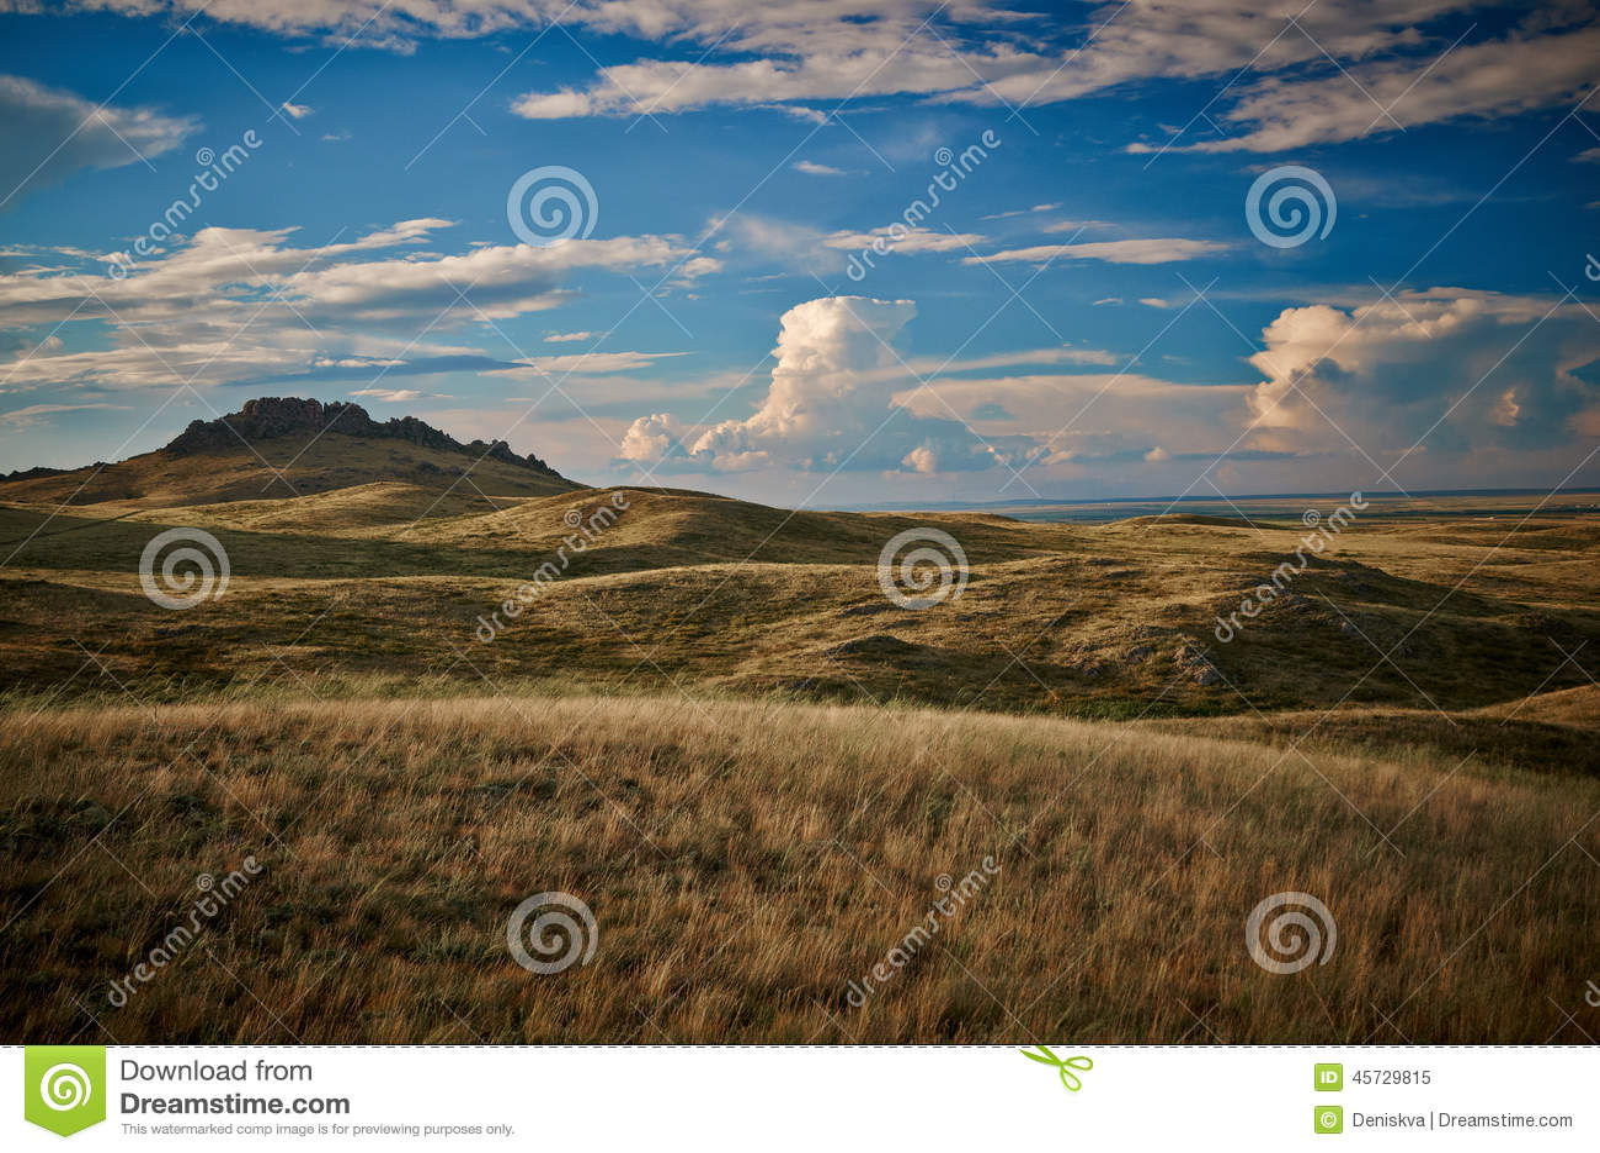 sch ne natur landschaft in kasachstan am sommer tag stockbild bild von kazakhstan berg 45729815. Black Bedroom Furniture Sets. Home Design Ideas